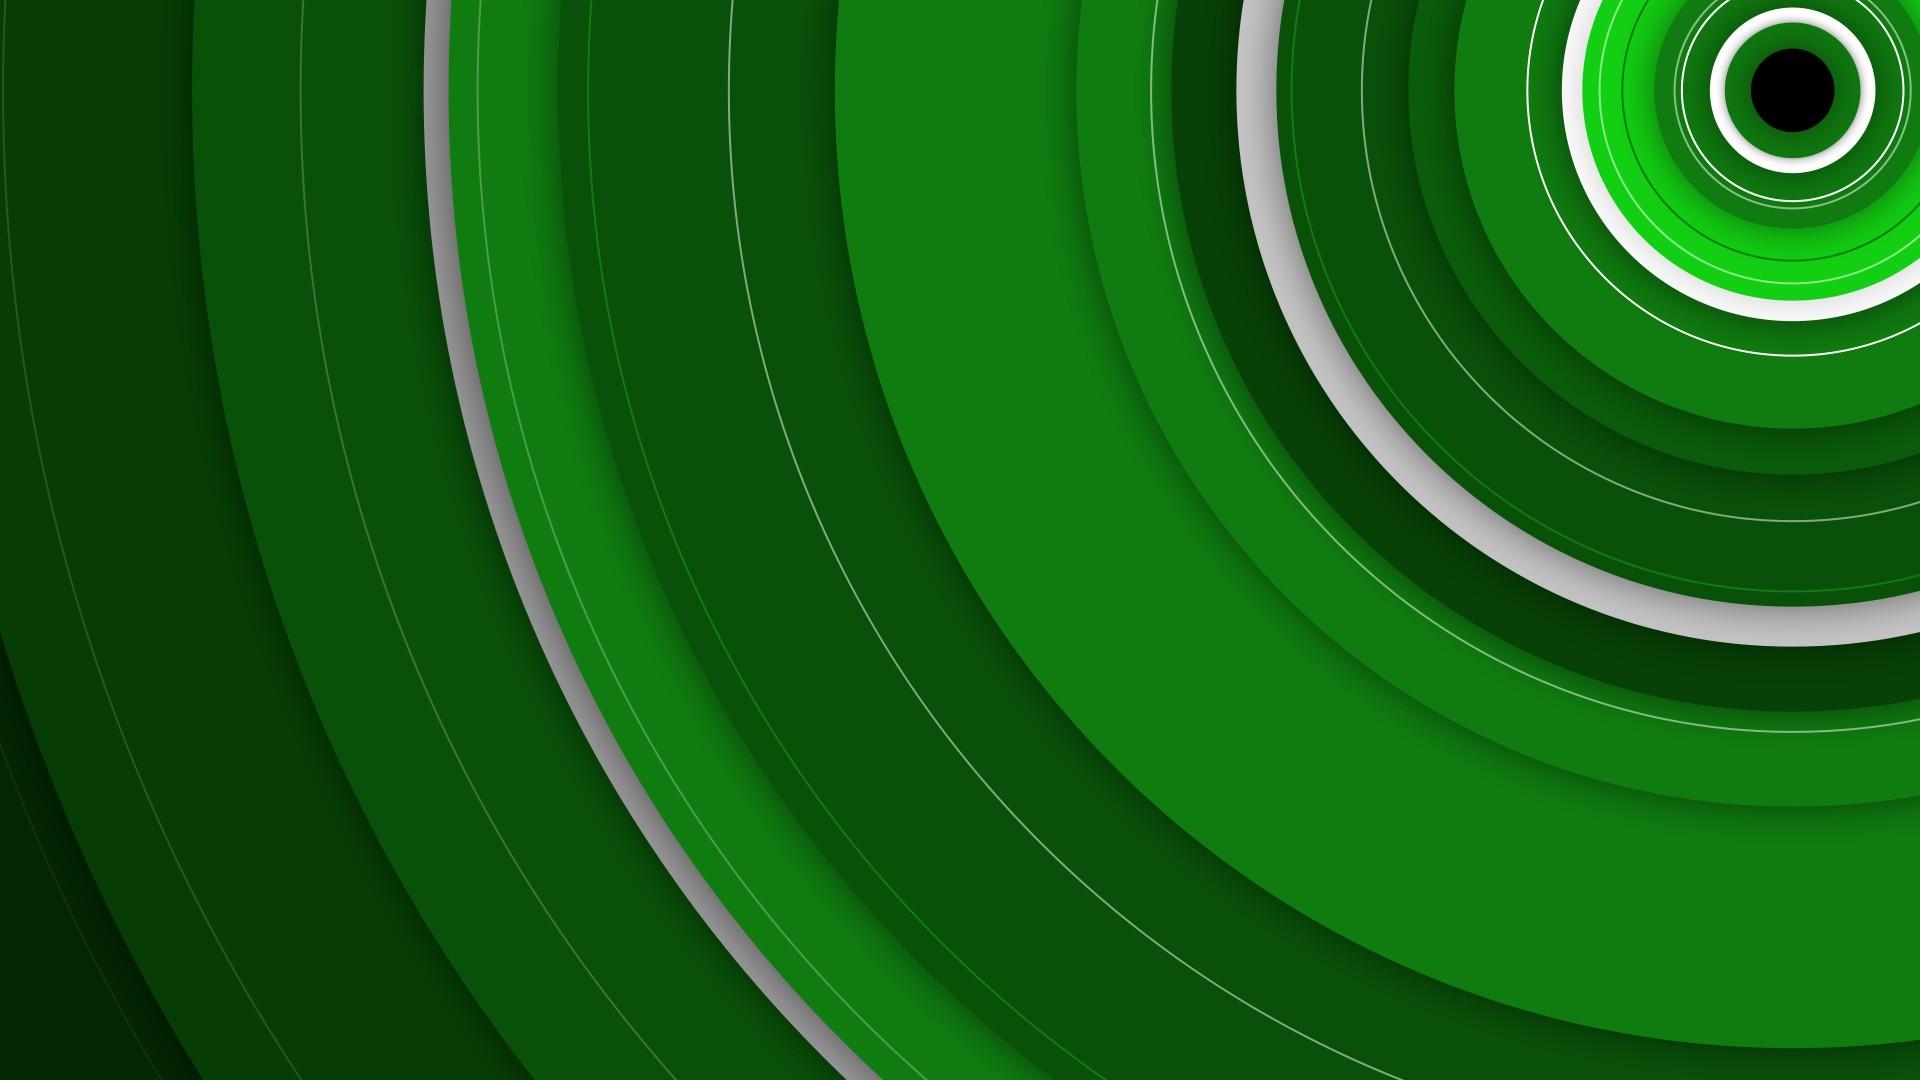 Xbox One Galaxy Wallpaper